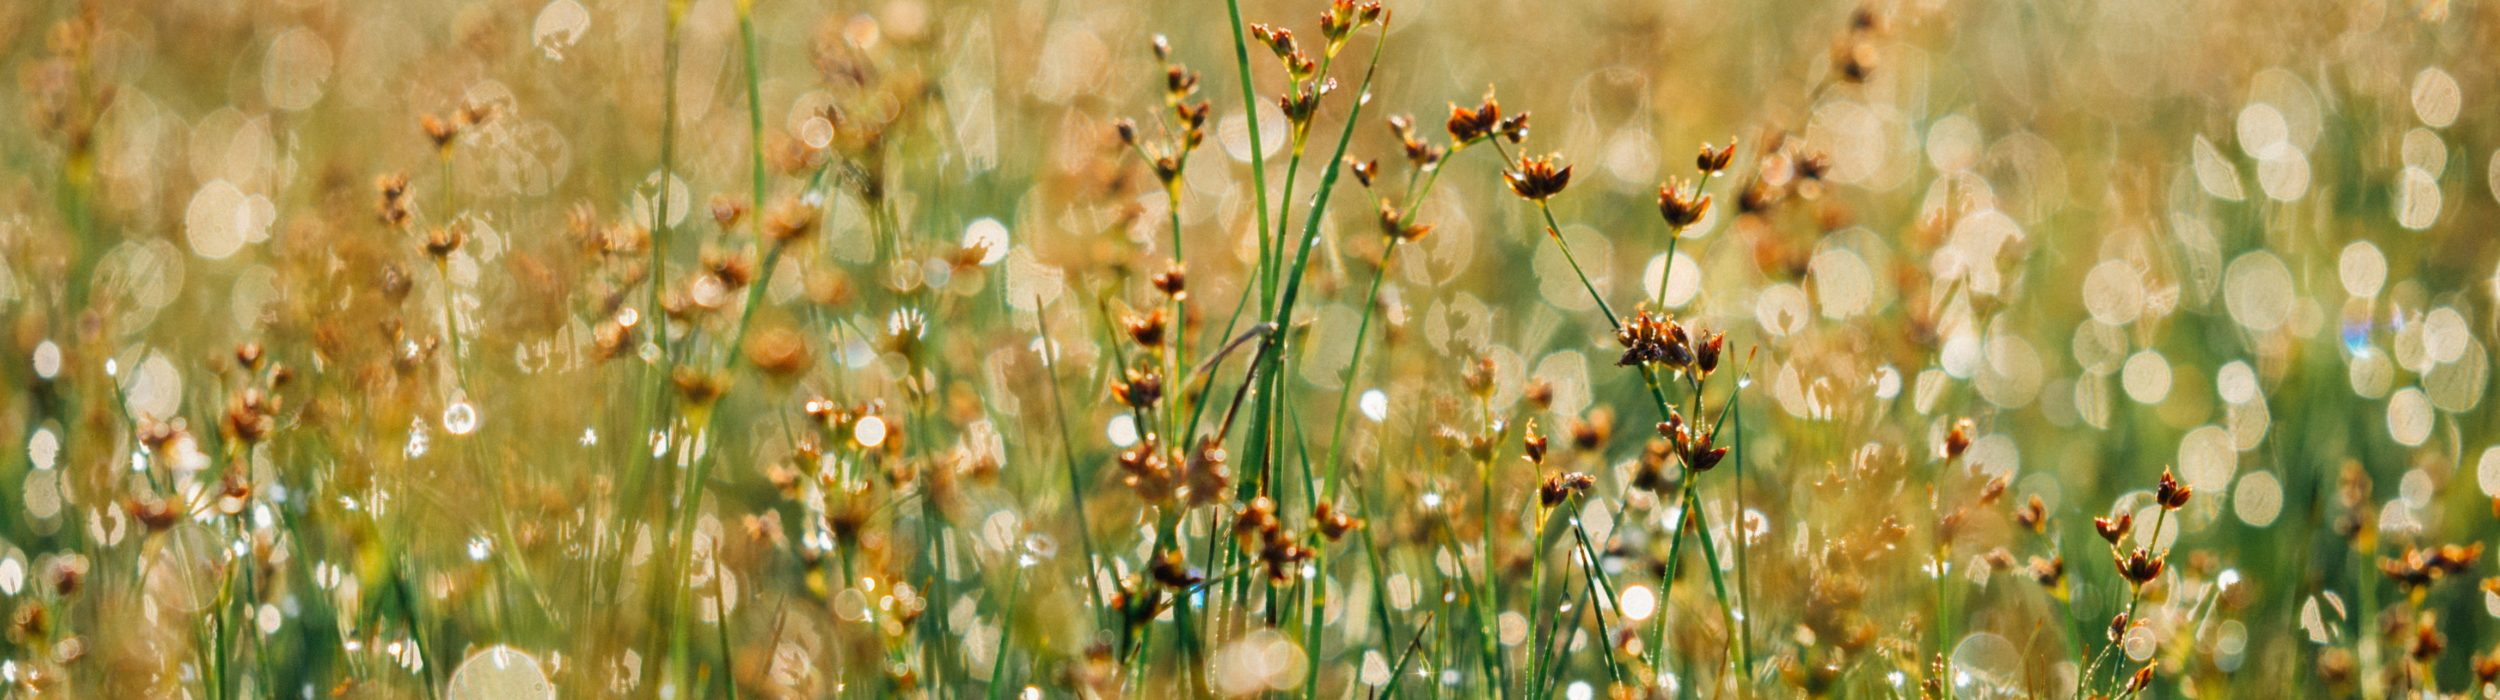 floral-865823